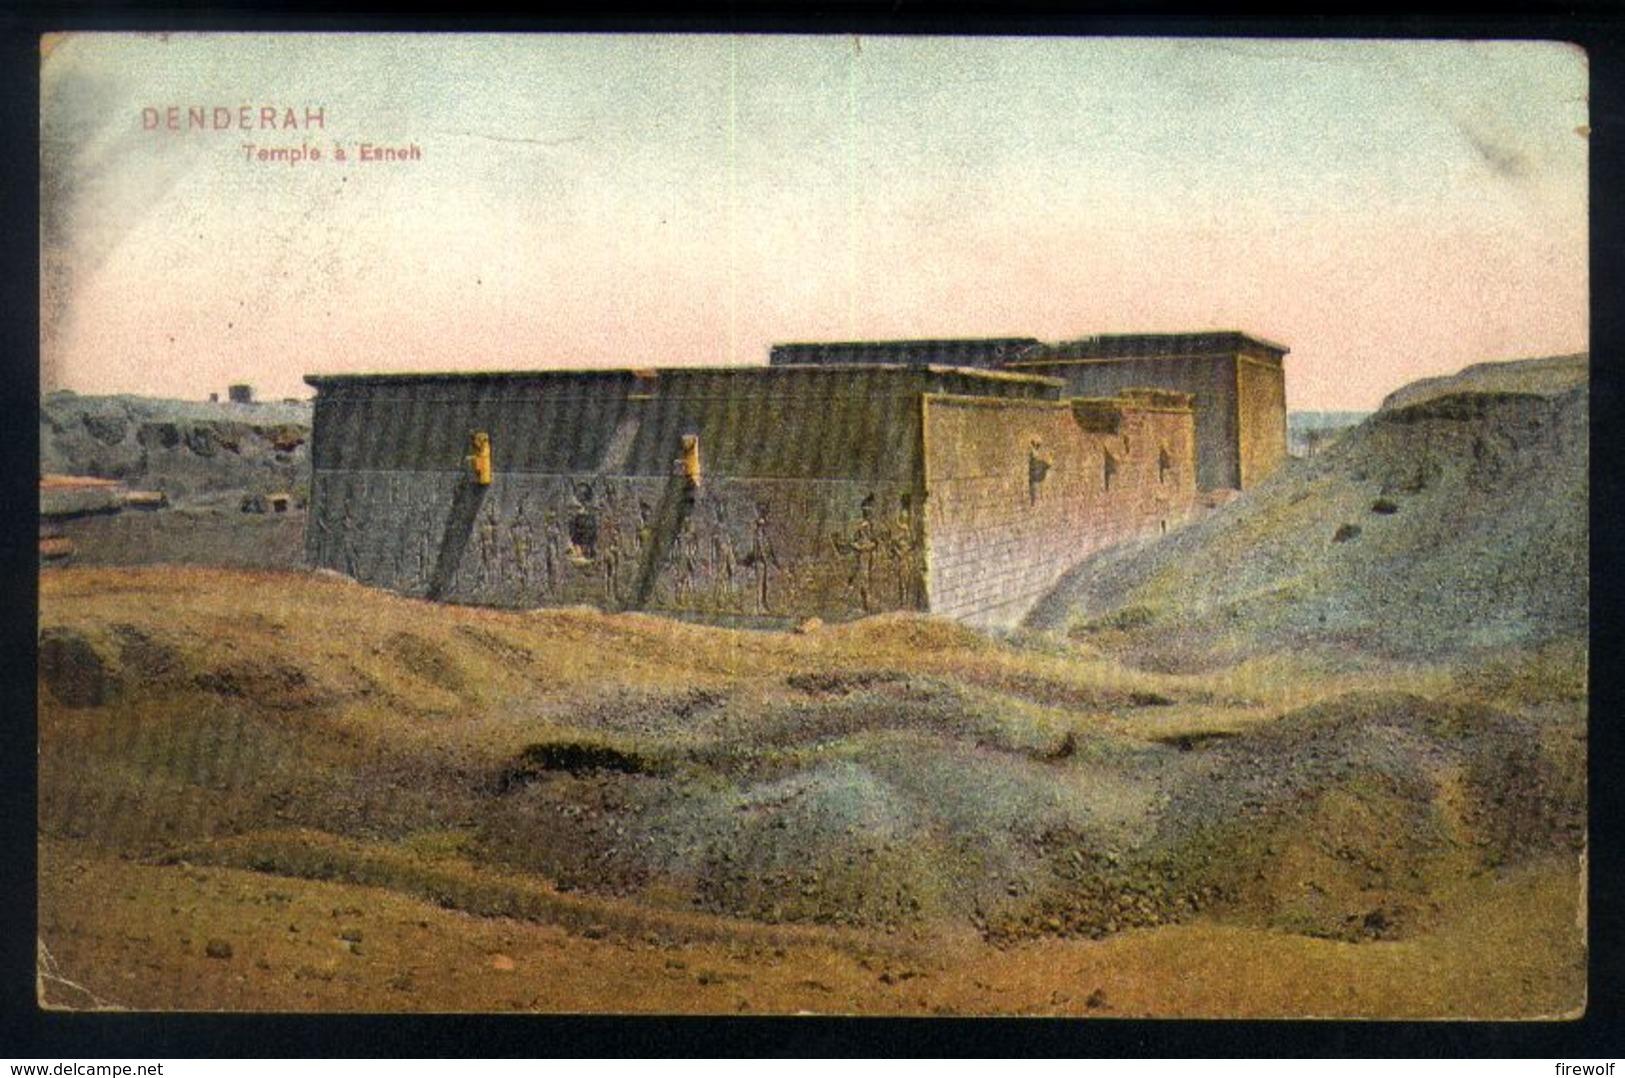 X05 - Egypt - PC Luxor Winter Palace To New York USA - 1909 - Denderah Temple A Esneh - Ägypten